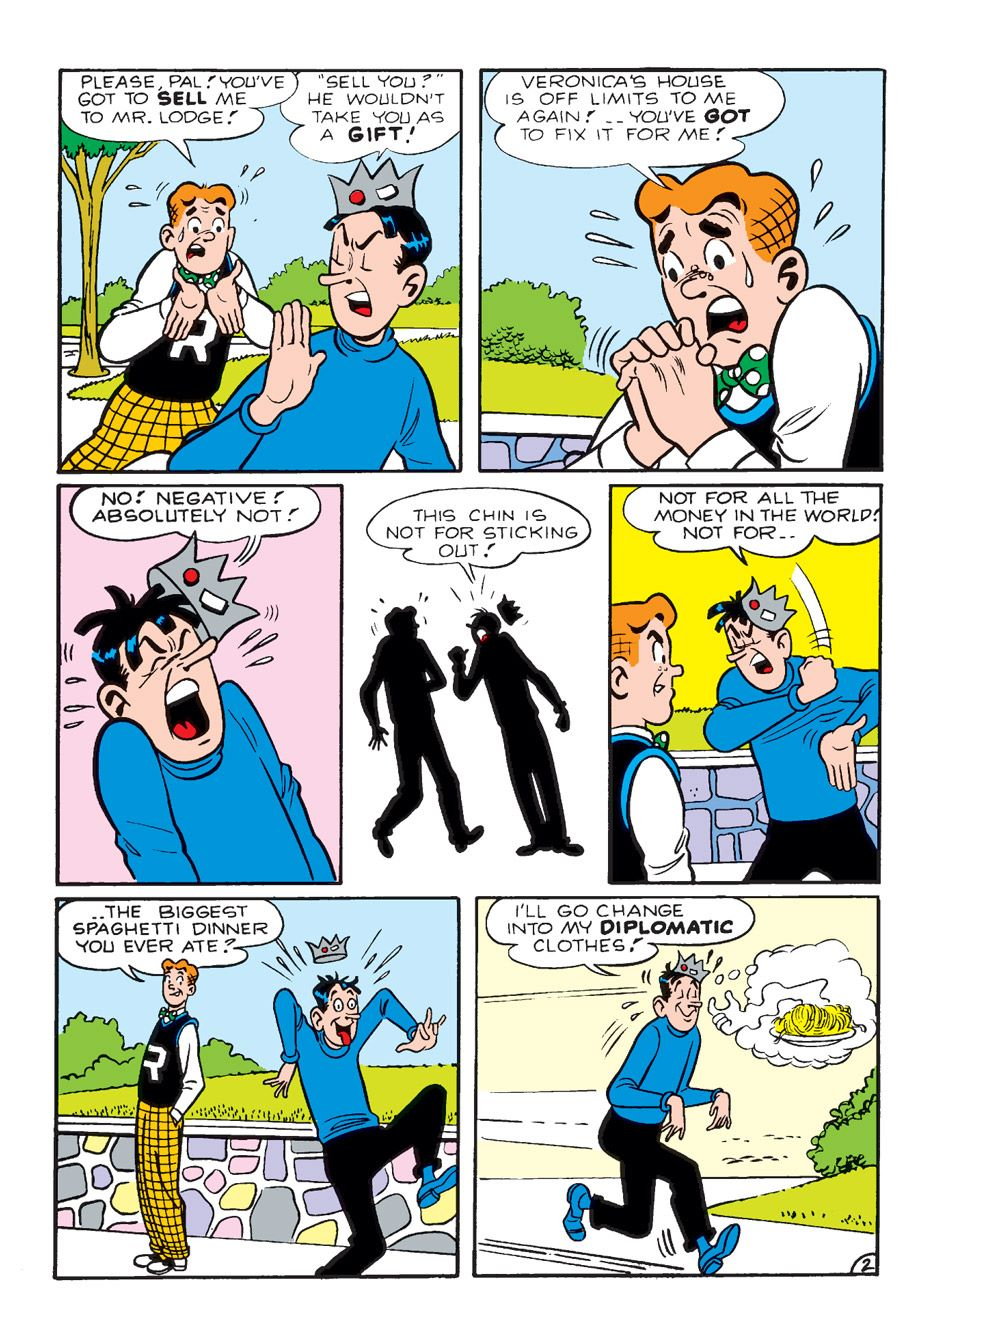 WorldOfArchieJumboComicsDigest_109-137 ComicList Previews: WORLD OF ARCHIE JUMBO COMICS DIGEST #109